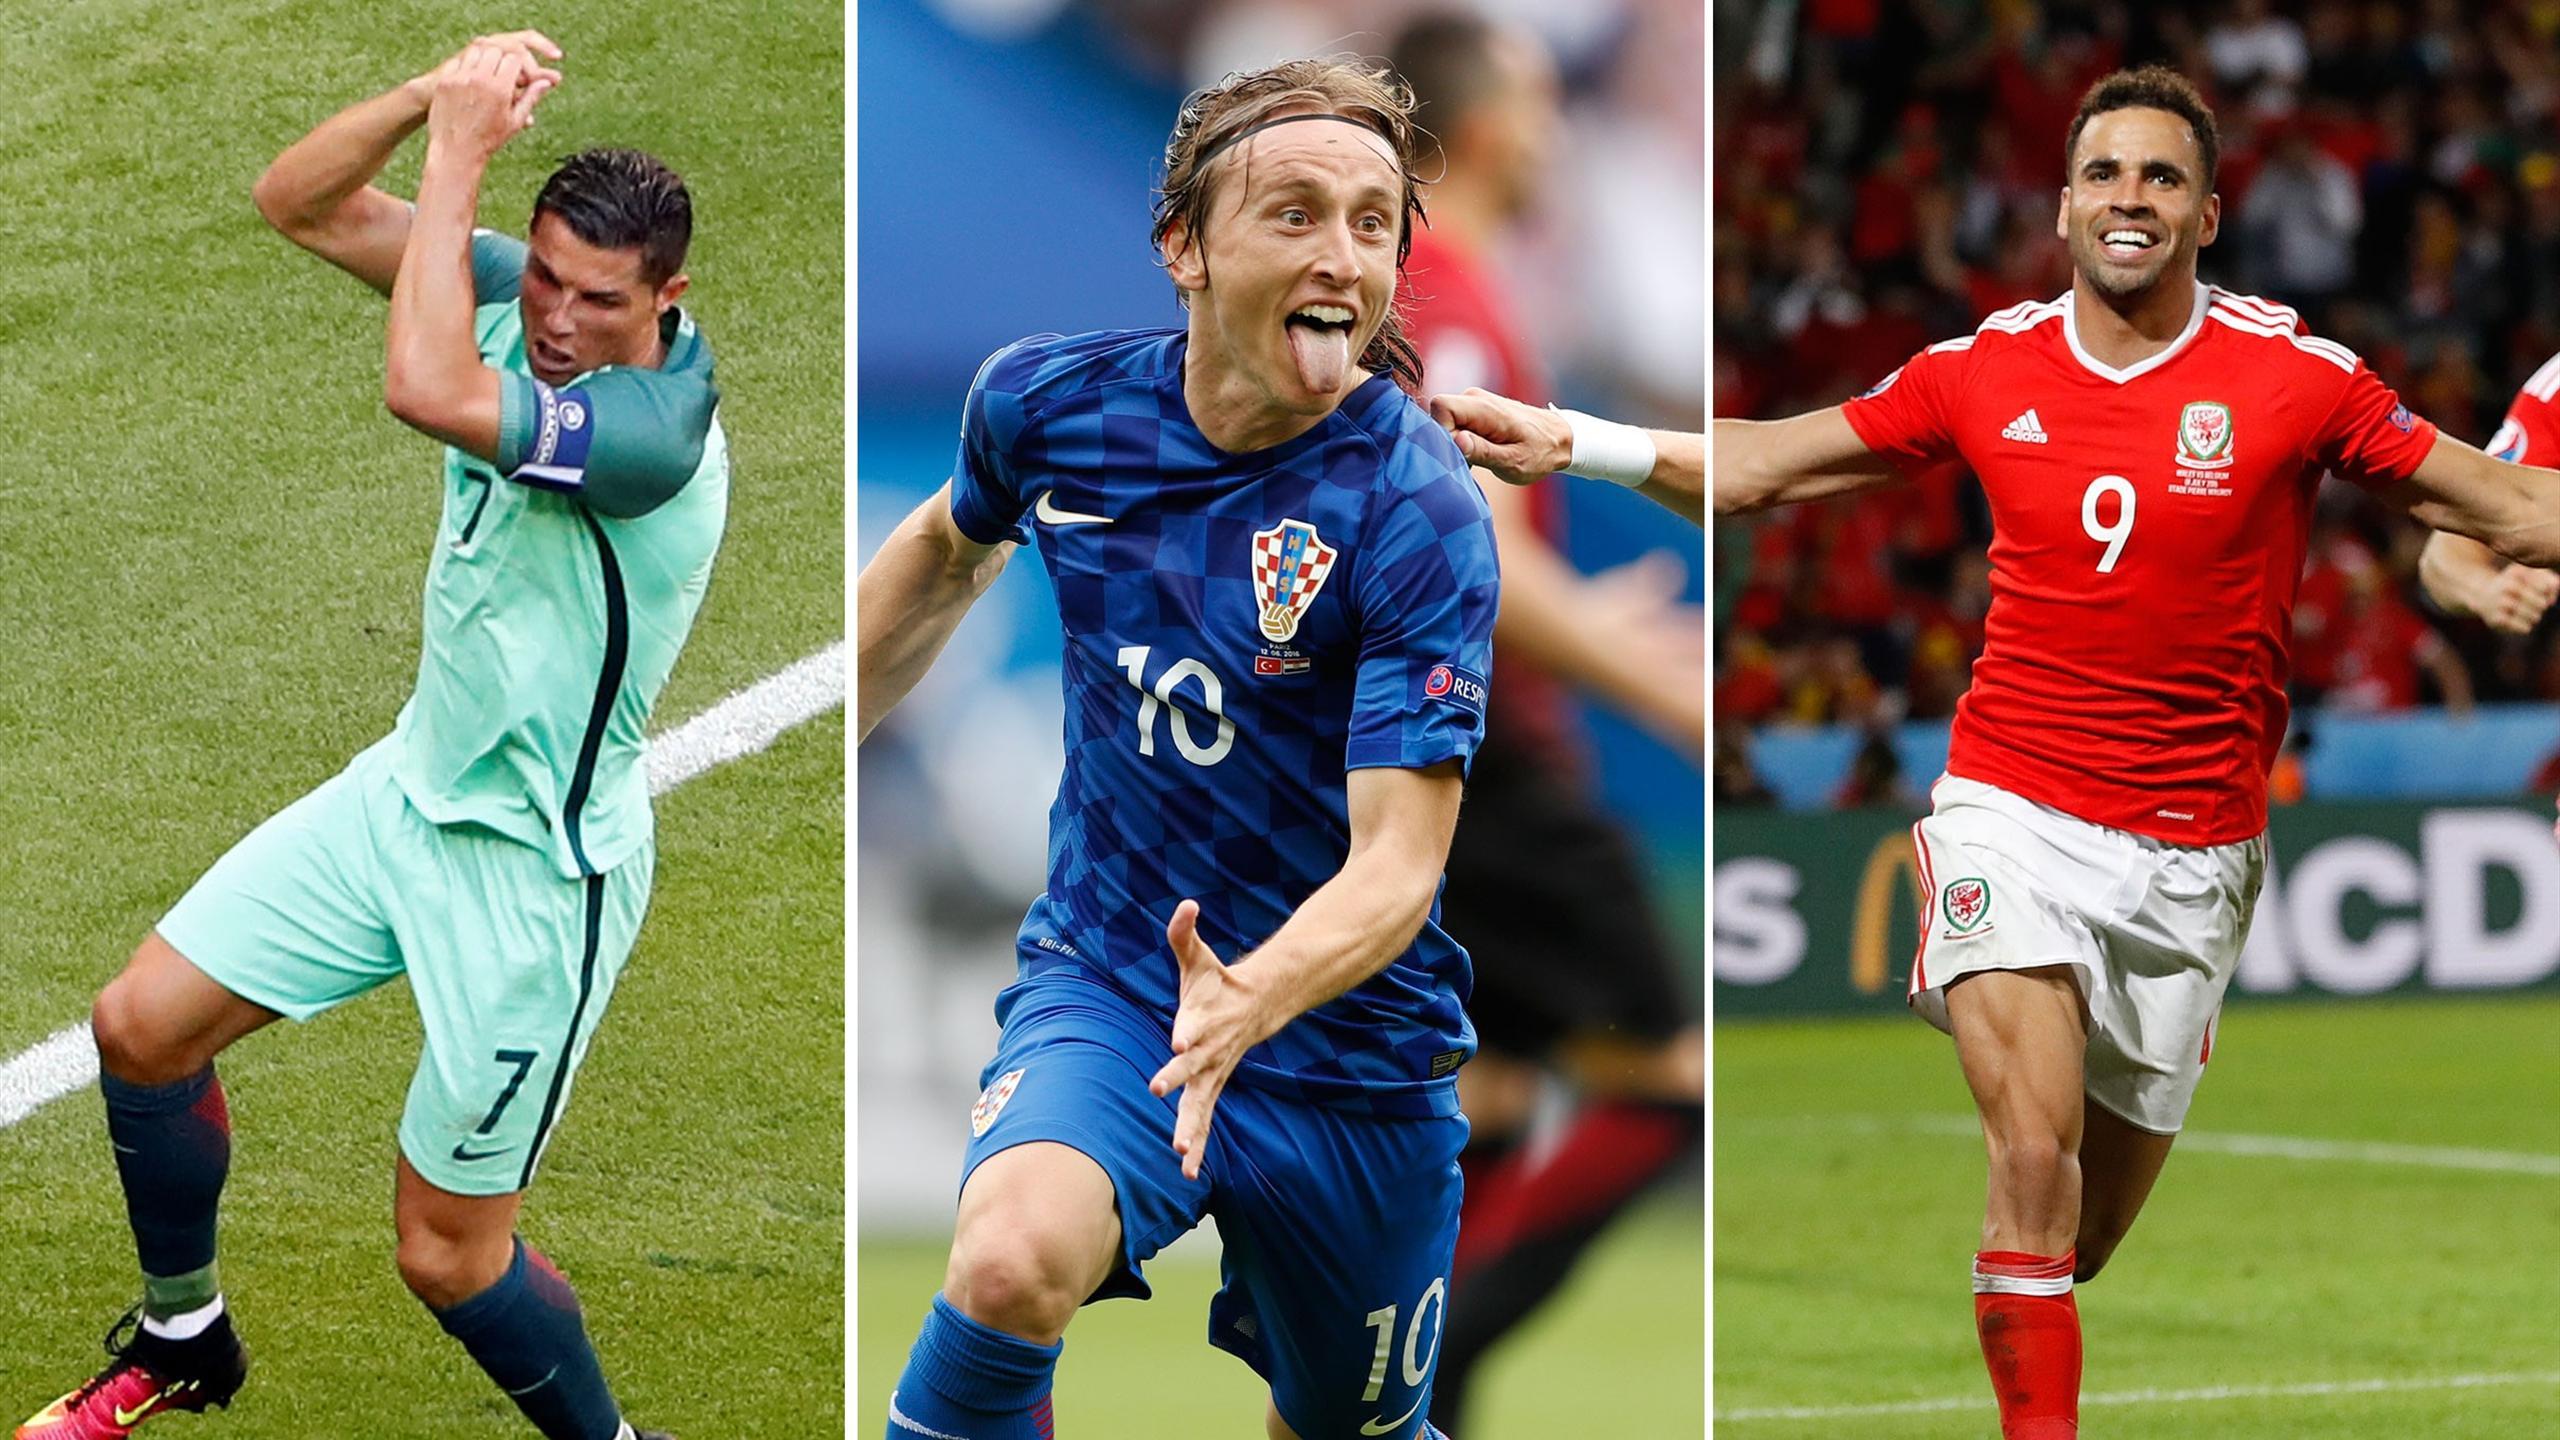 Cristiano Ronaldo of Portugal, Luka Modric of Croatia and Hal Robson-Kanu of Wales